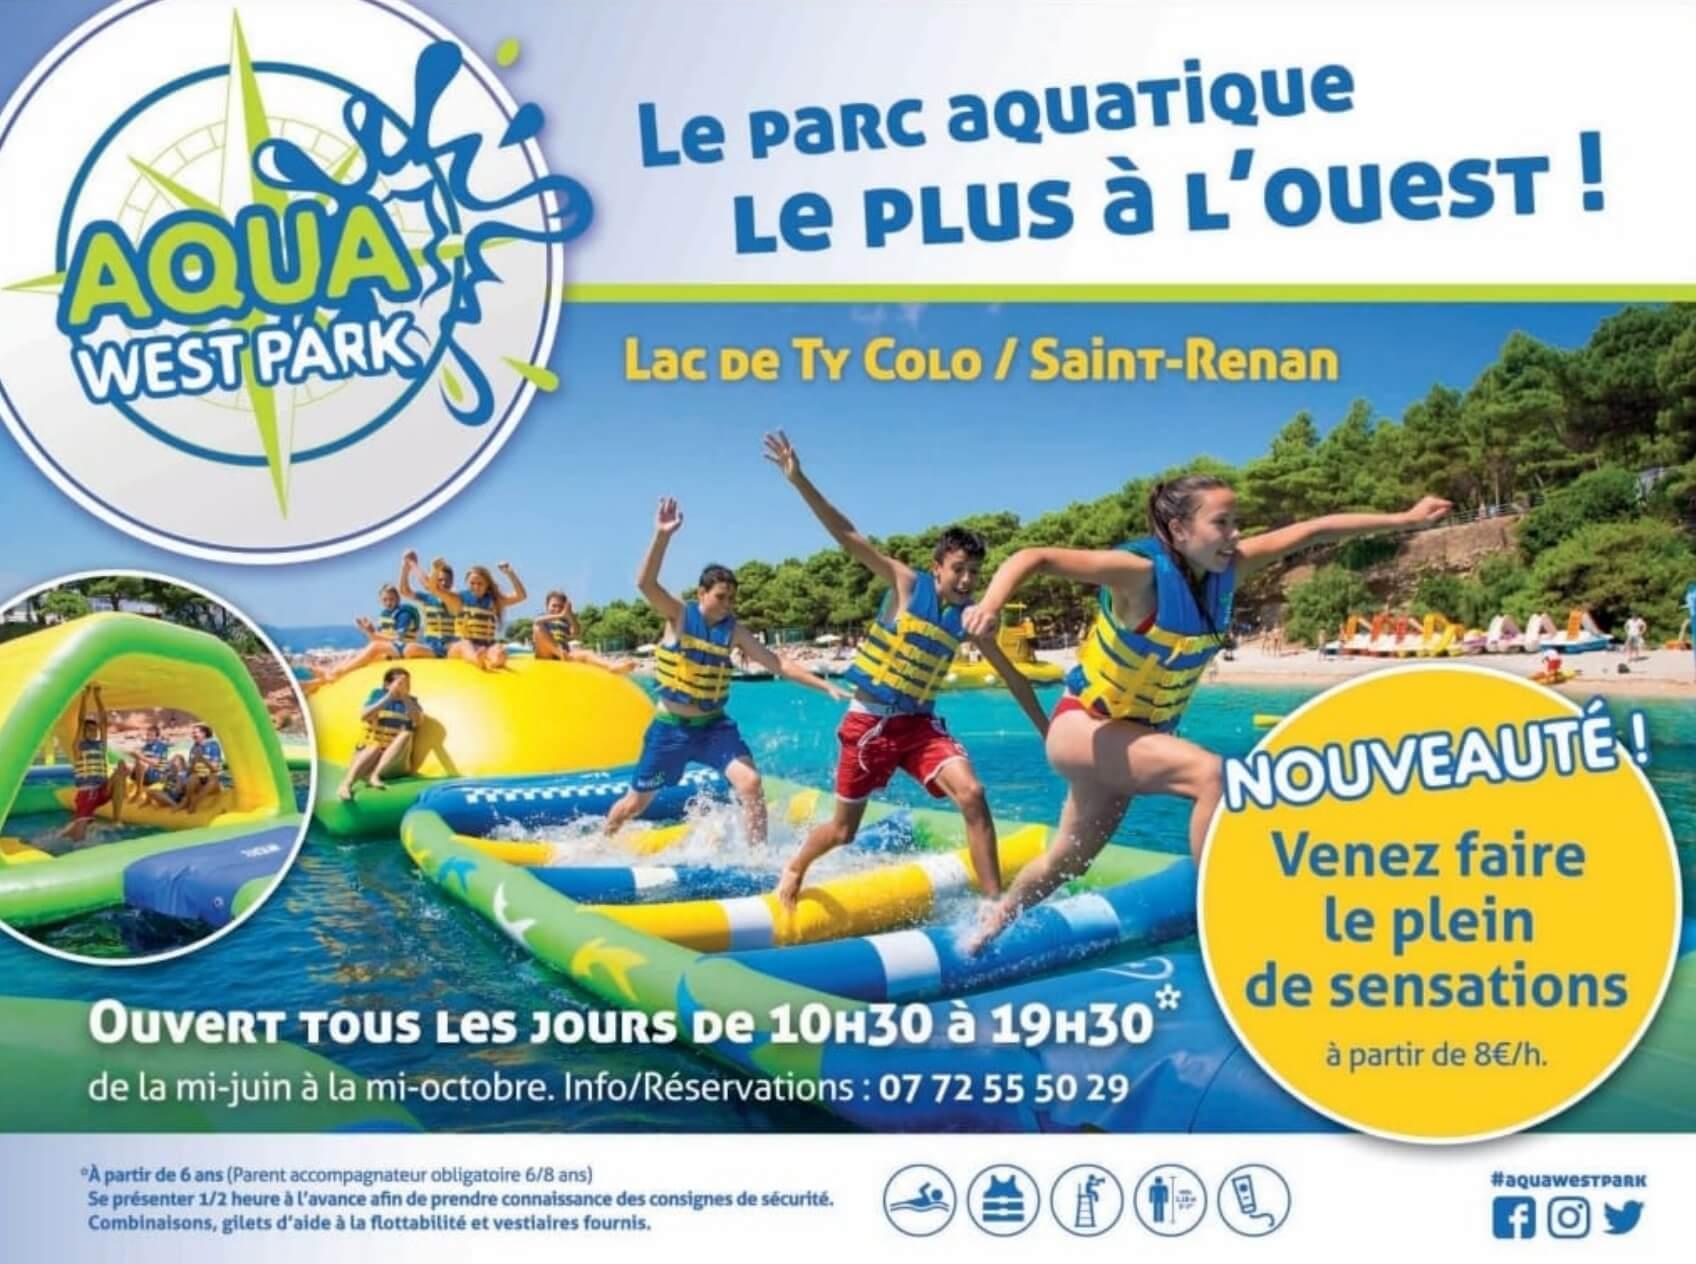 Aquawest Parc